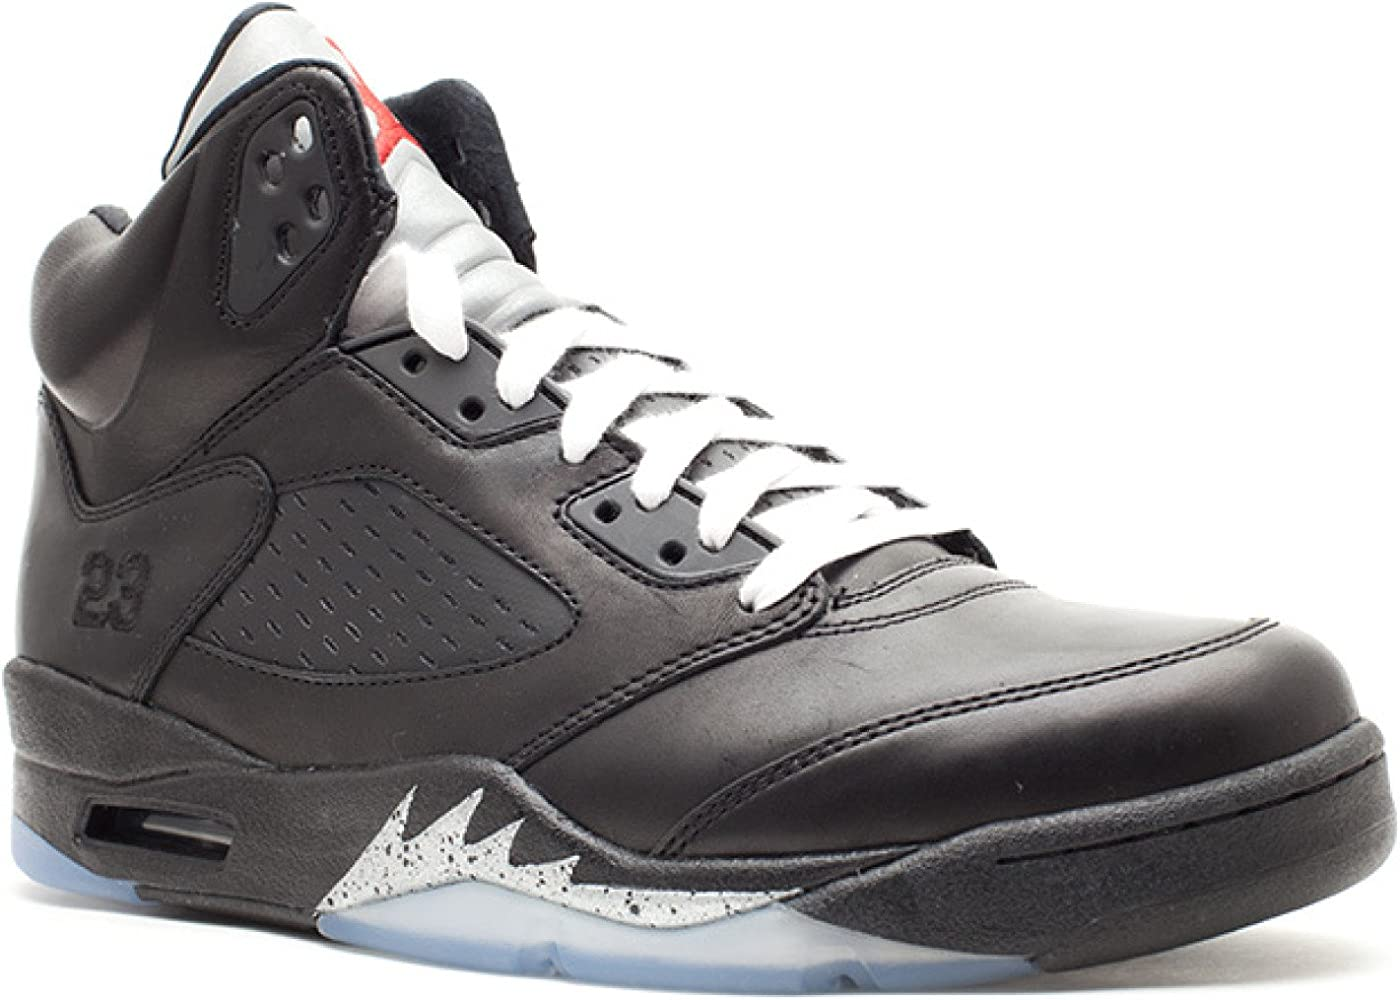 Nike Mens Air Jordan 5 Retro Premio Bin